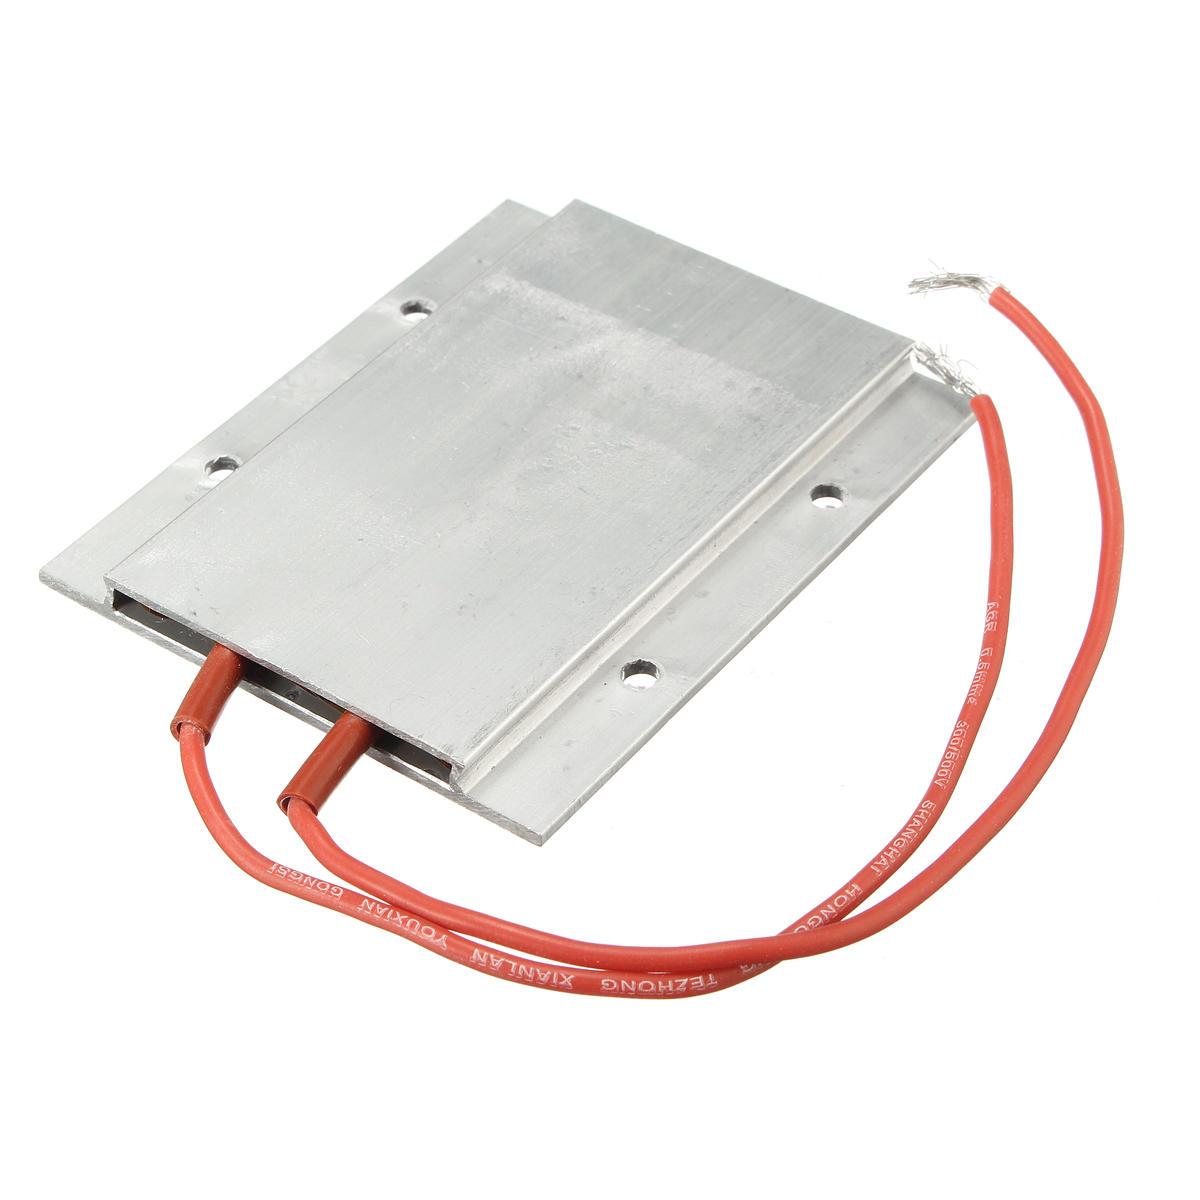 200W AC / DC 220V 77 x 62 x 6mm PTC Thermostat Aluminum Heating Ceramic Heater Incubator Dehumidification